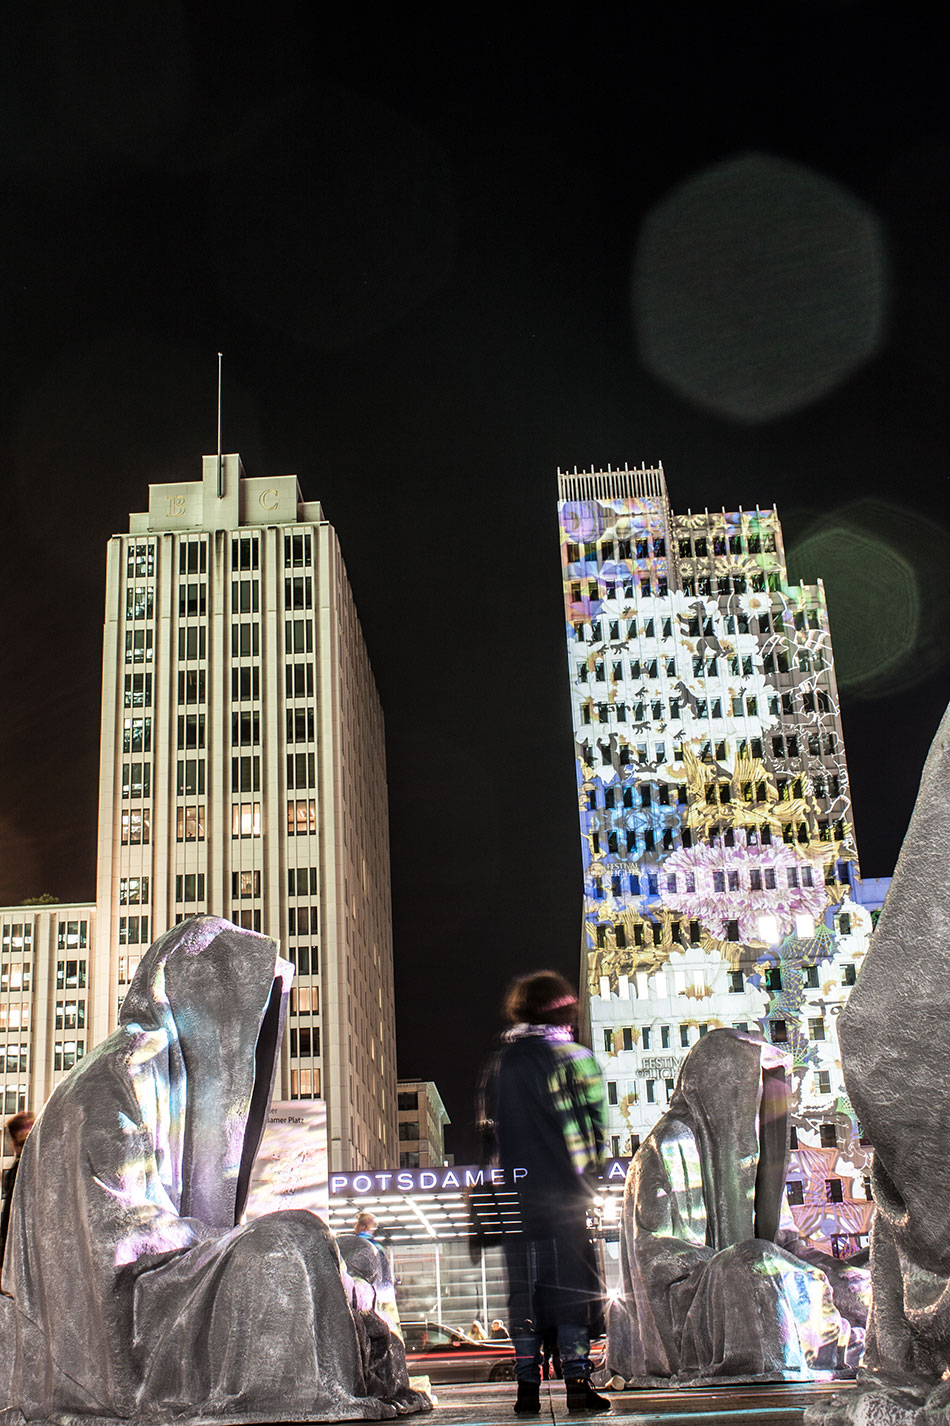 festival-of-lights-berlin-potzdamer-platz-light-art-show-exhibition-lumina-guardians-of-time-manfred-kili-kielnhofer-contemporary-arts-design-sculpture-3205